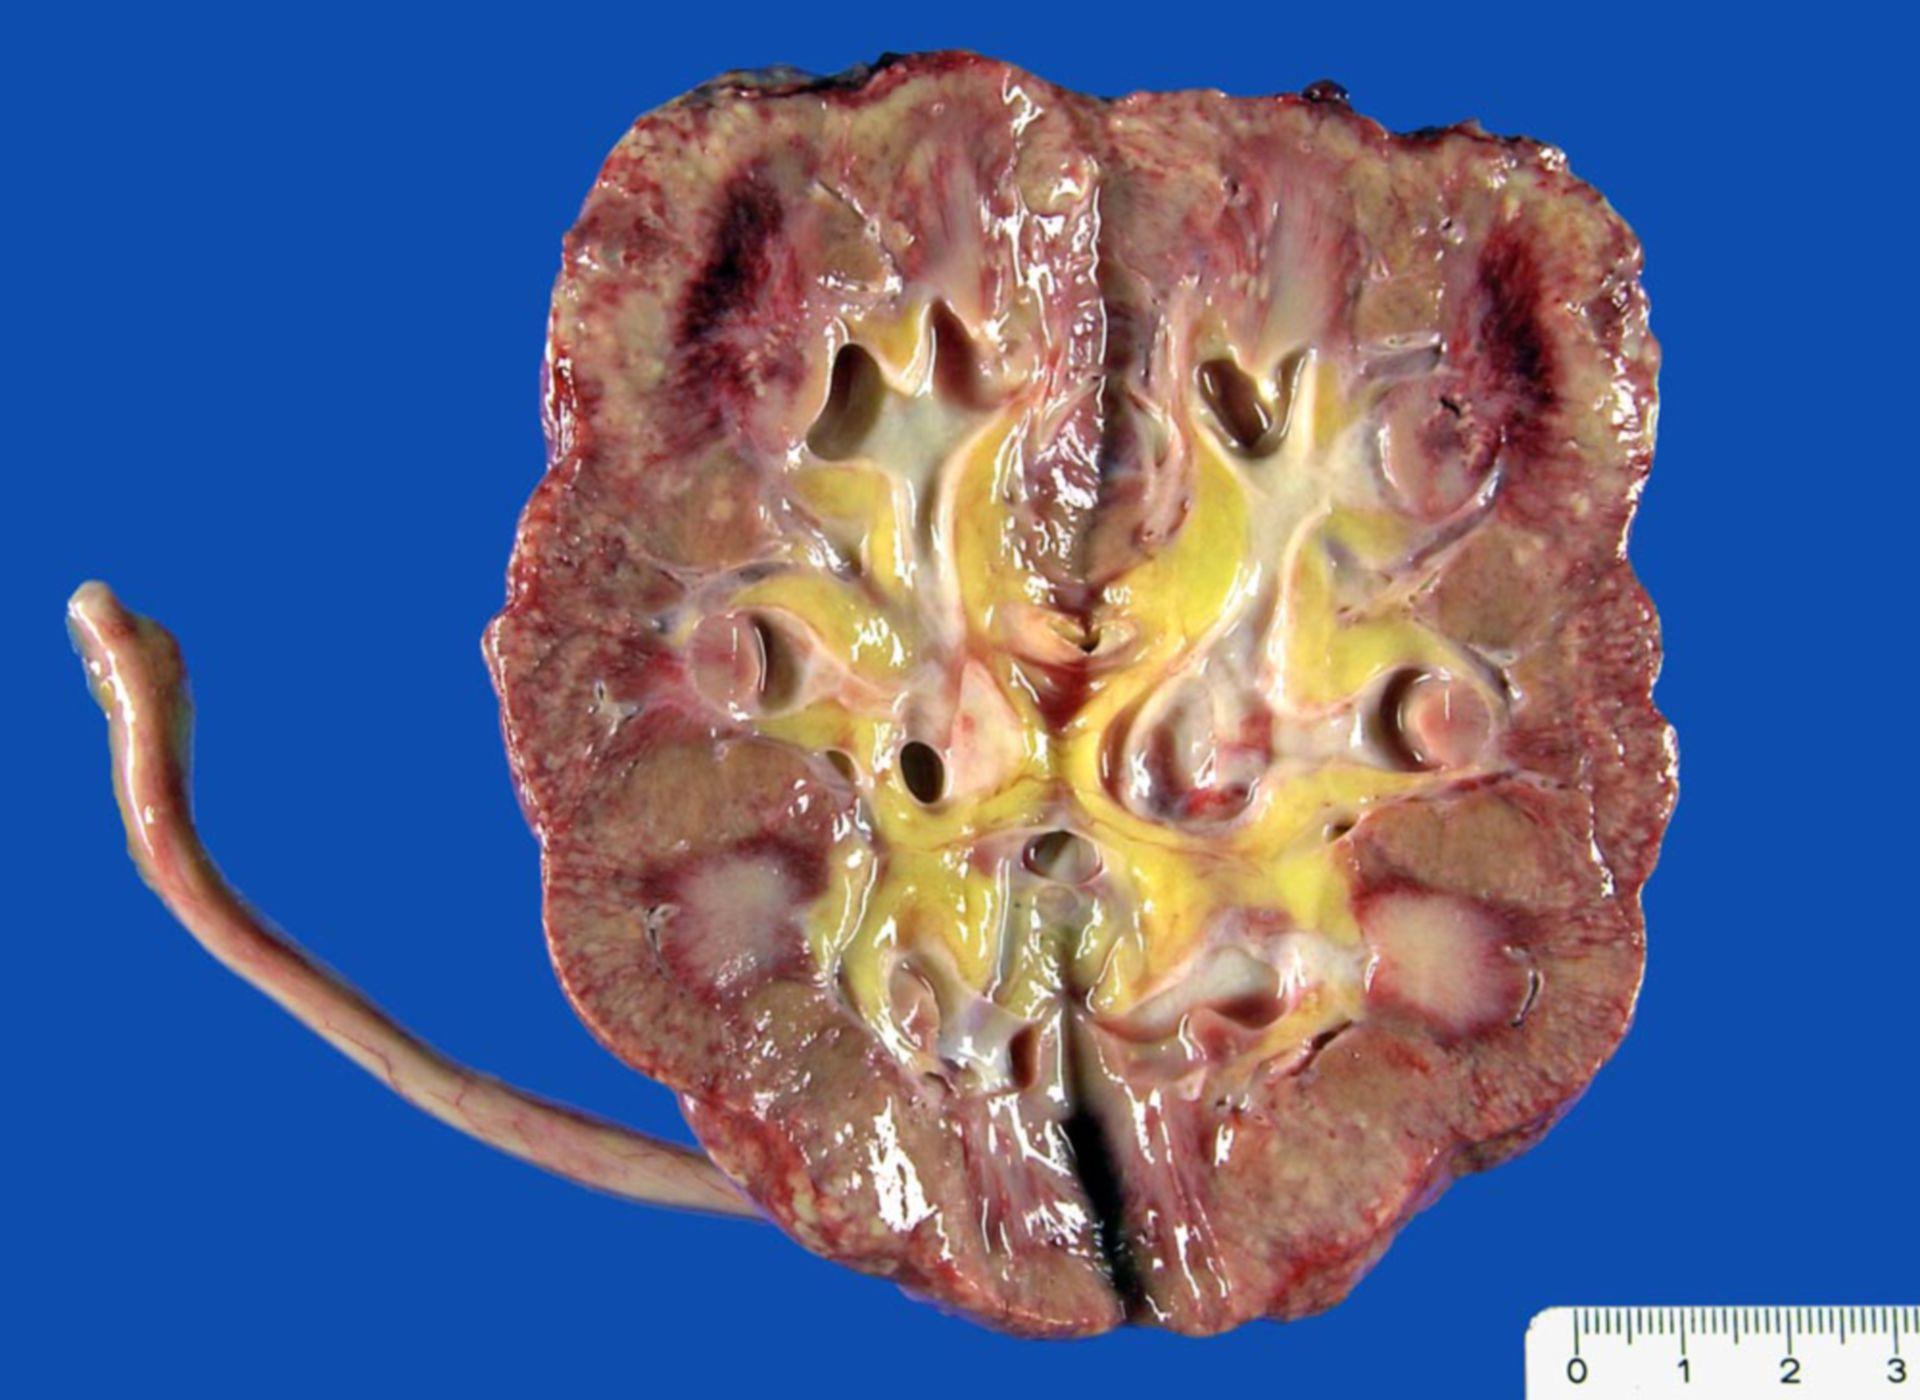 Akute Pyelonephritis (destruktive interstititelle Nephritis)